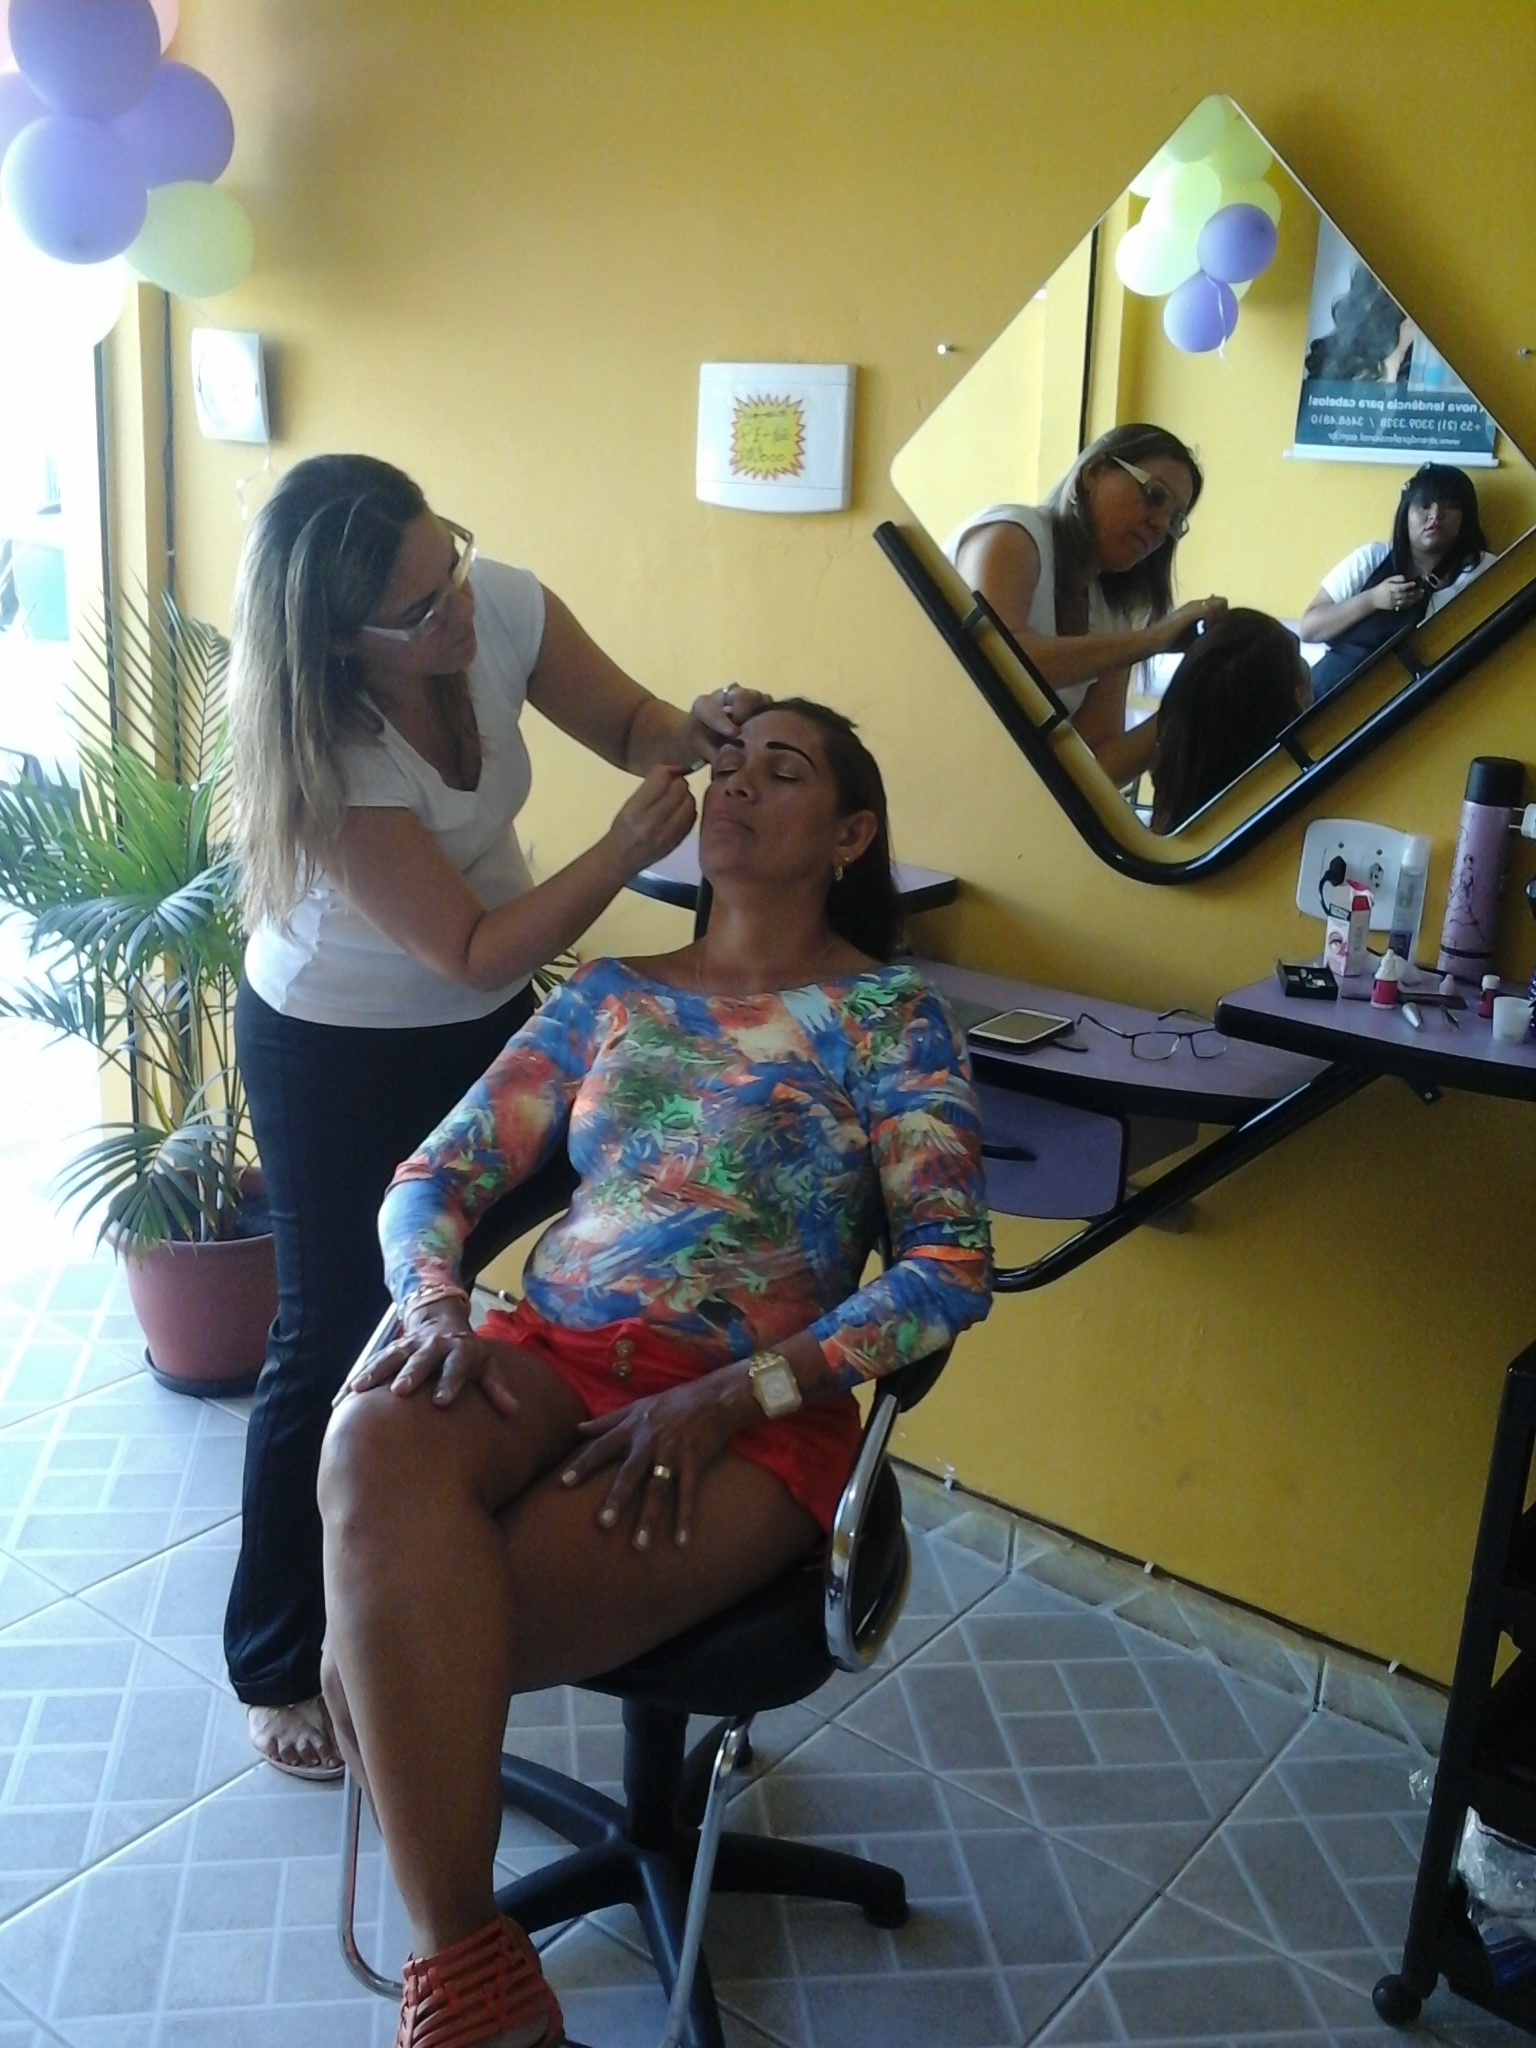 esteticista manicure e pedicure massagista representante comercial